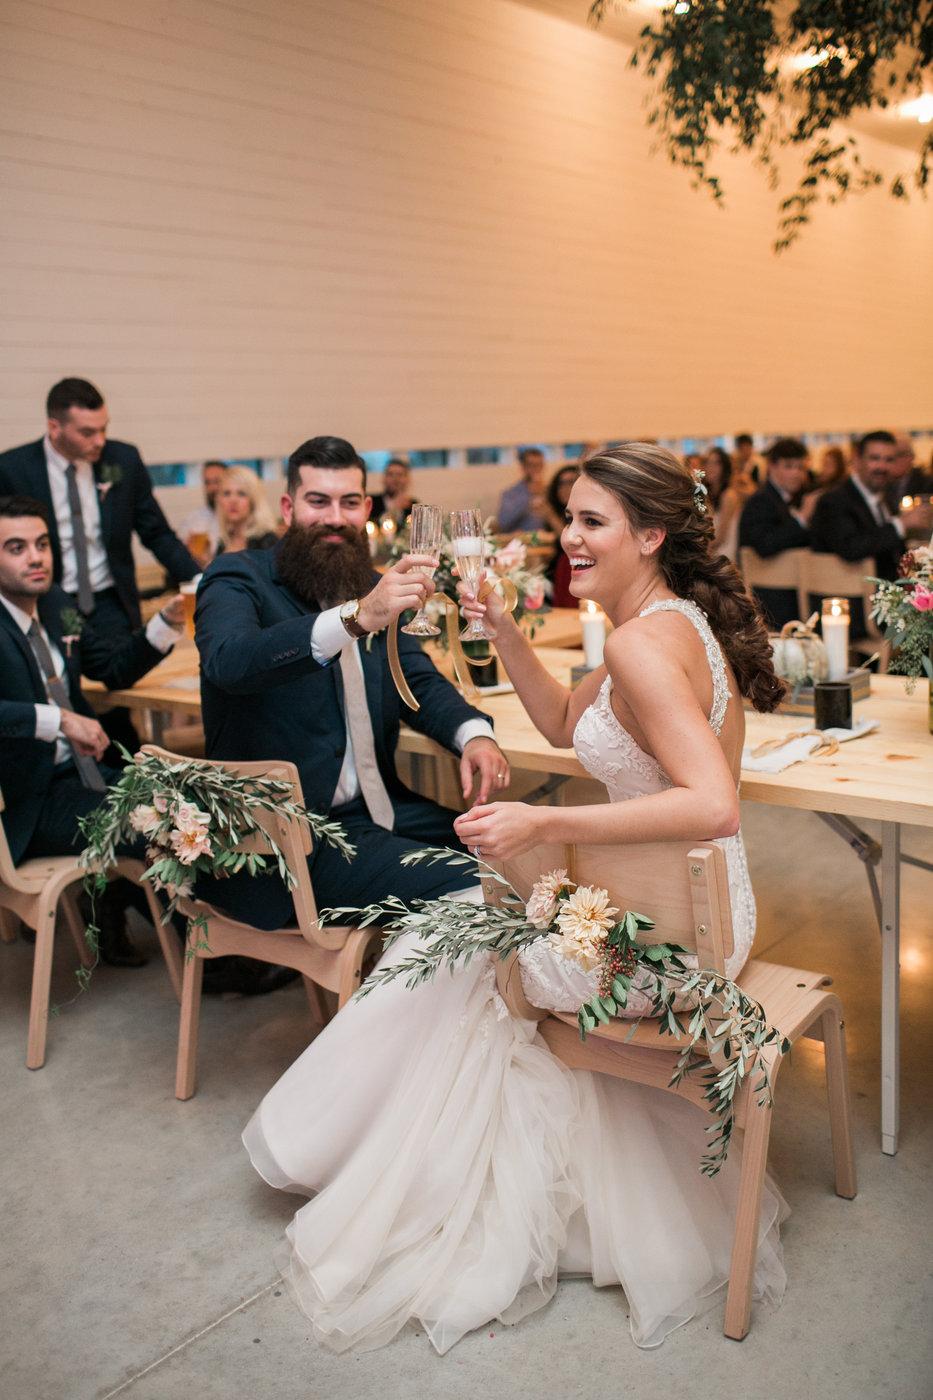 Andrew Alexa Wedding at Prospect House-JPEG 2-0009.jpg